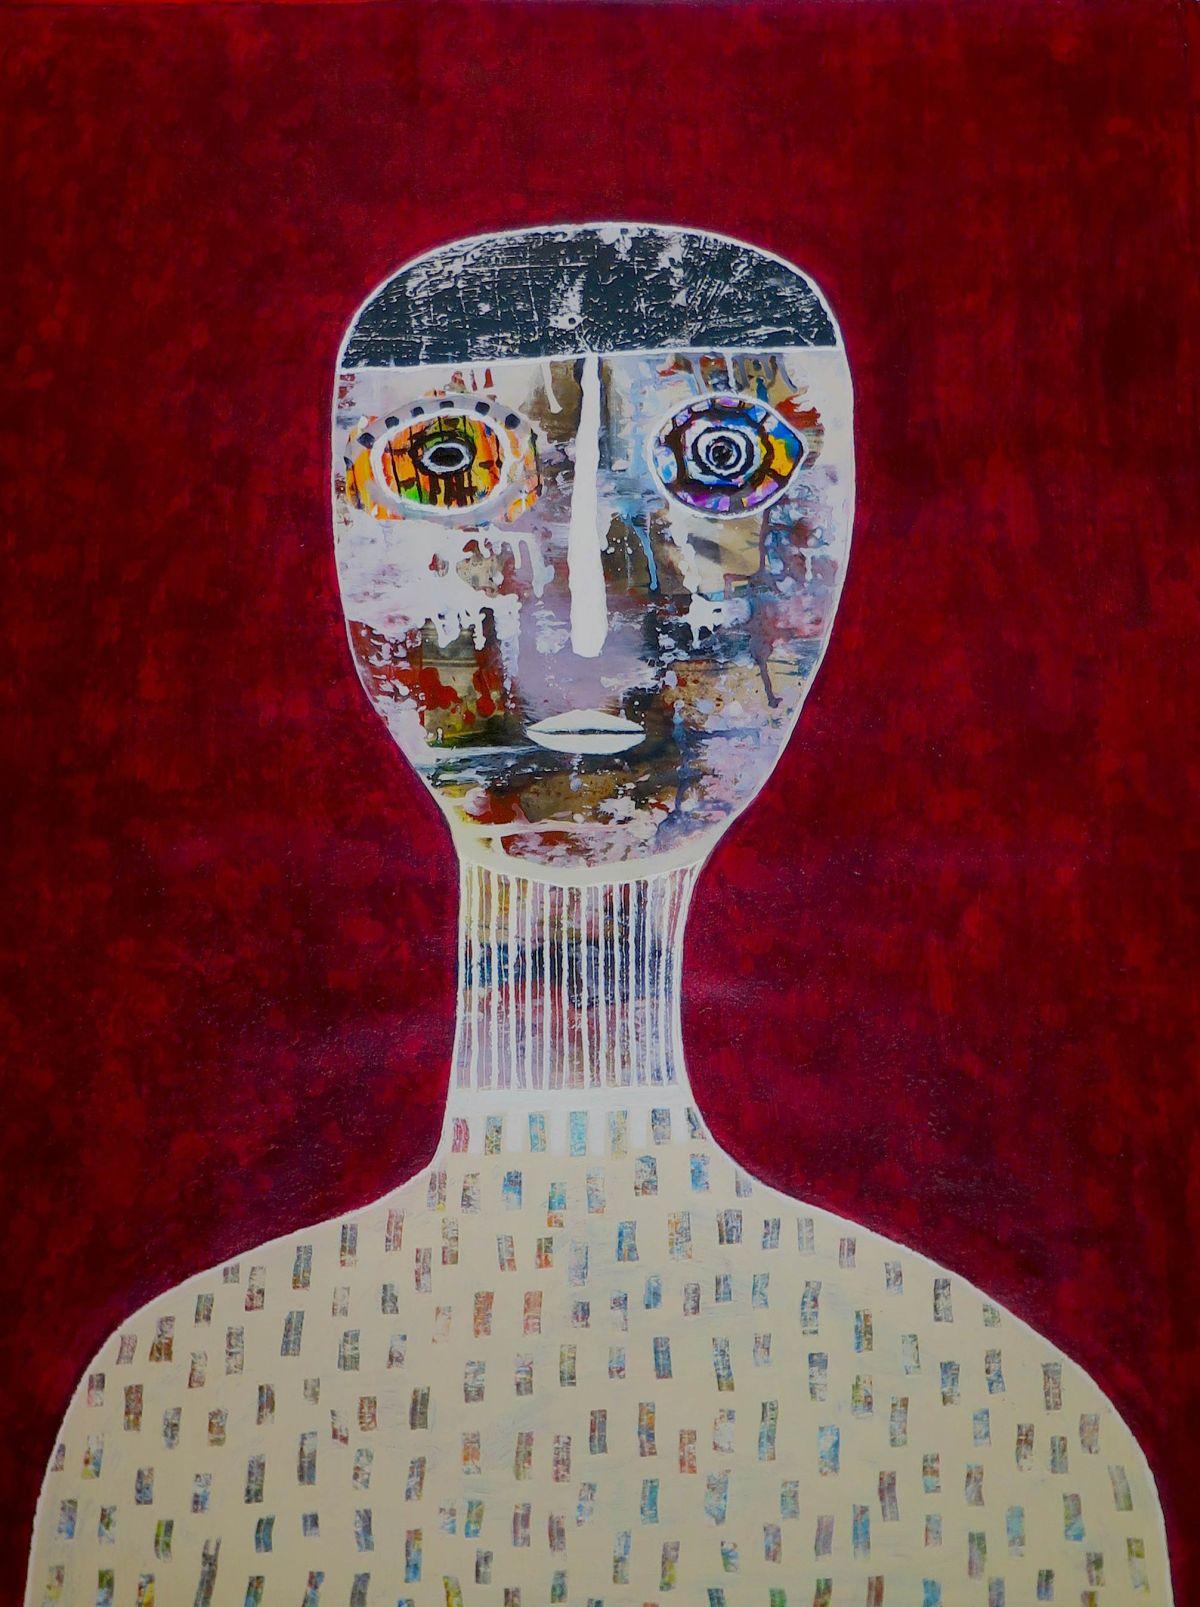 bryant-toth-fine-art-hector-frank-exhibition-10